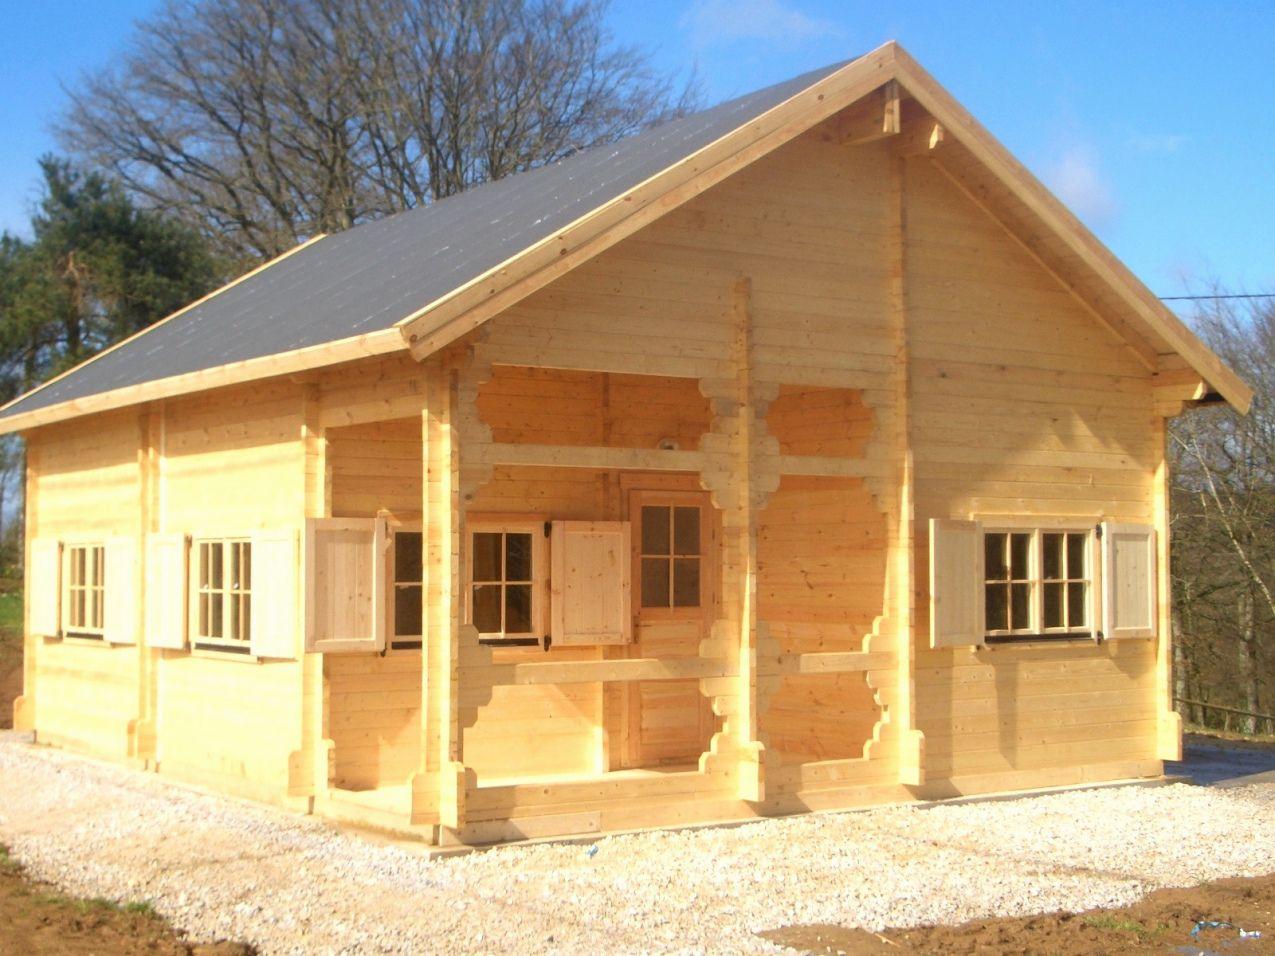 201 Abri De Jardin Grosfillex Soldes 2020 Check More At Https Www Unionjacktrooper Com 20 Abri De Jardin Grosfillex Soldes 20 Outdoor Structures House Styles